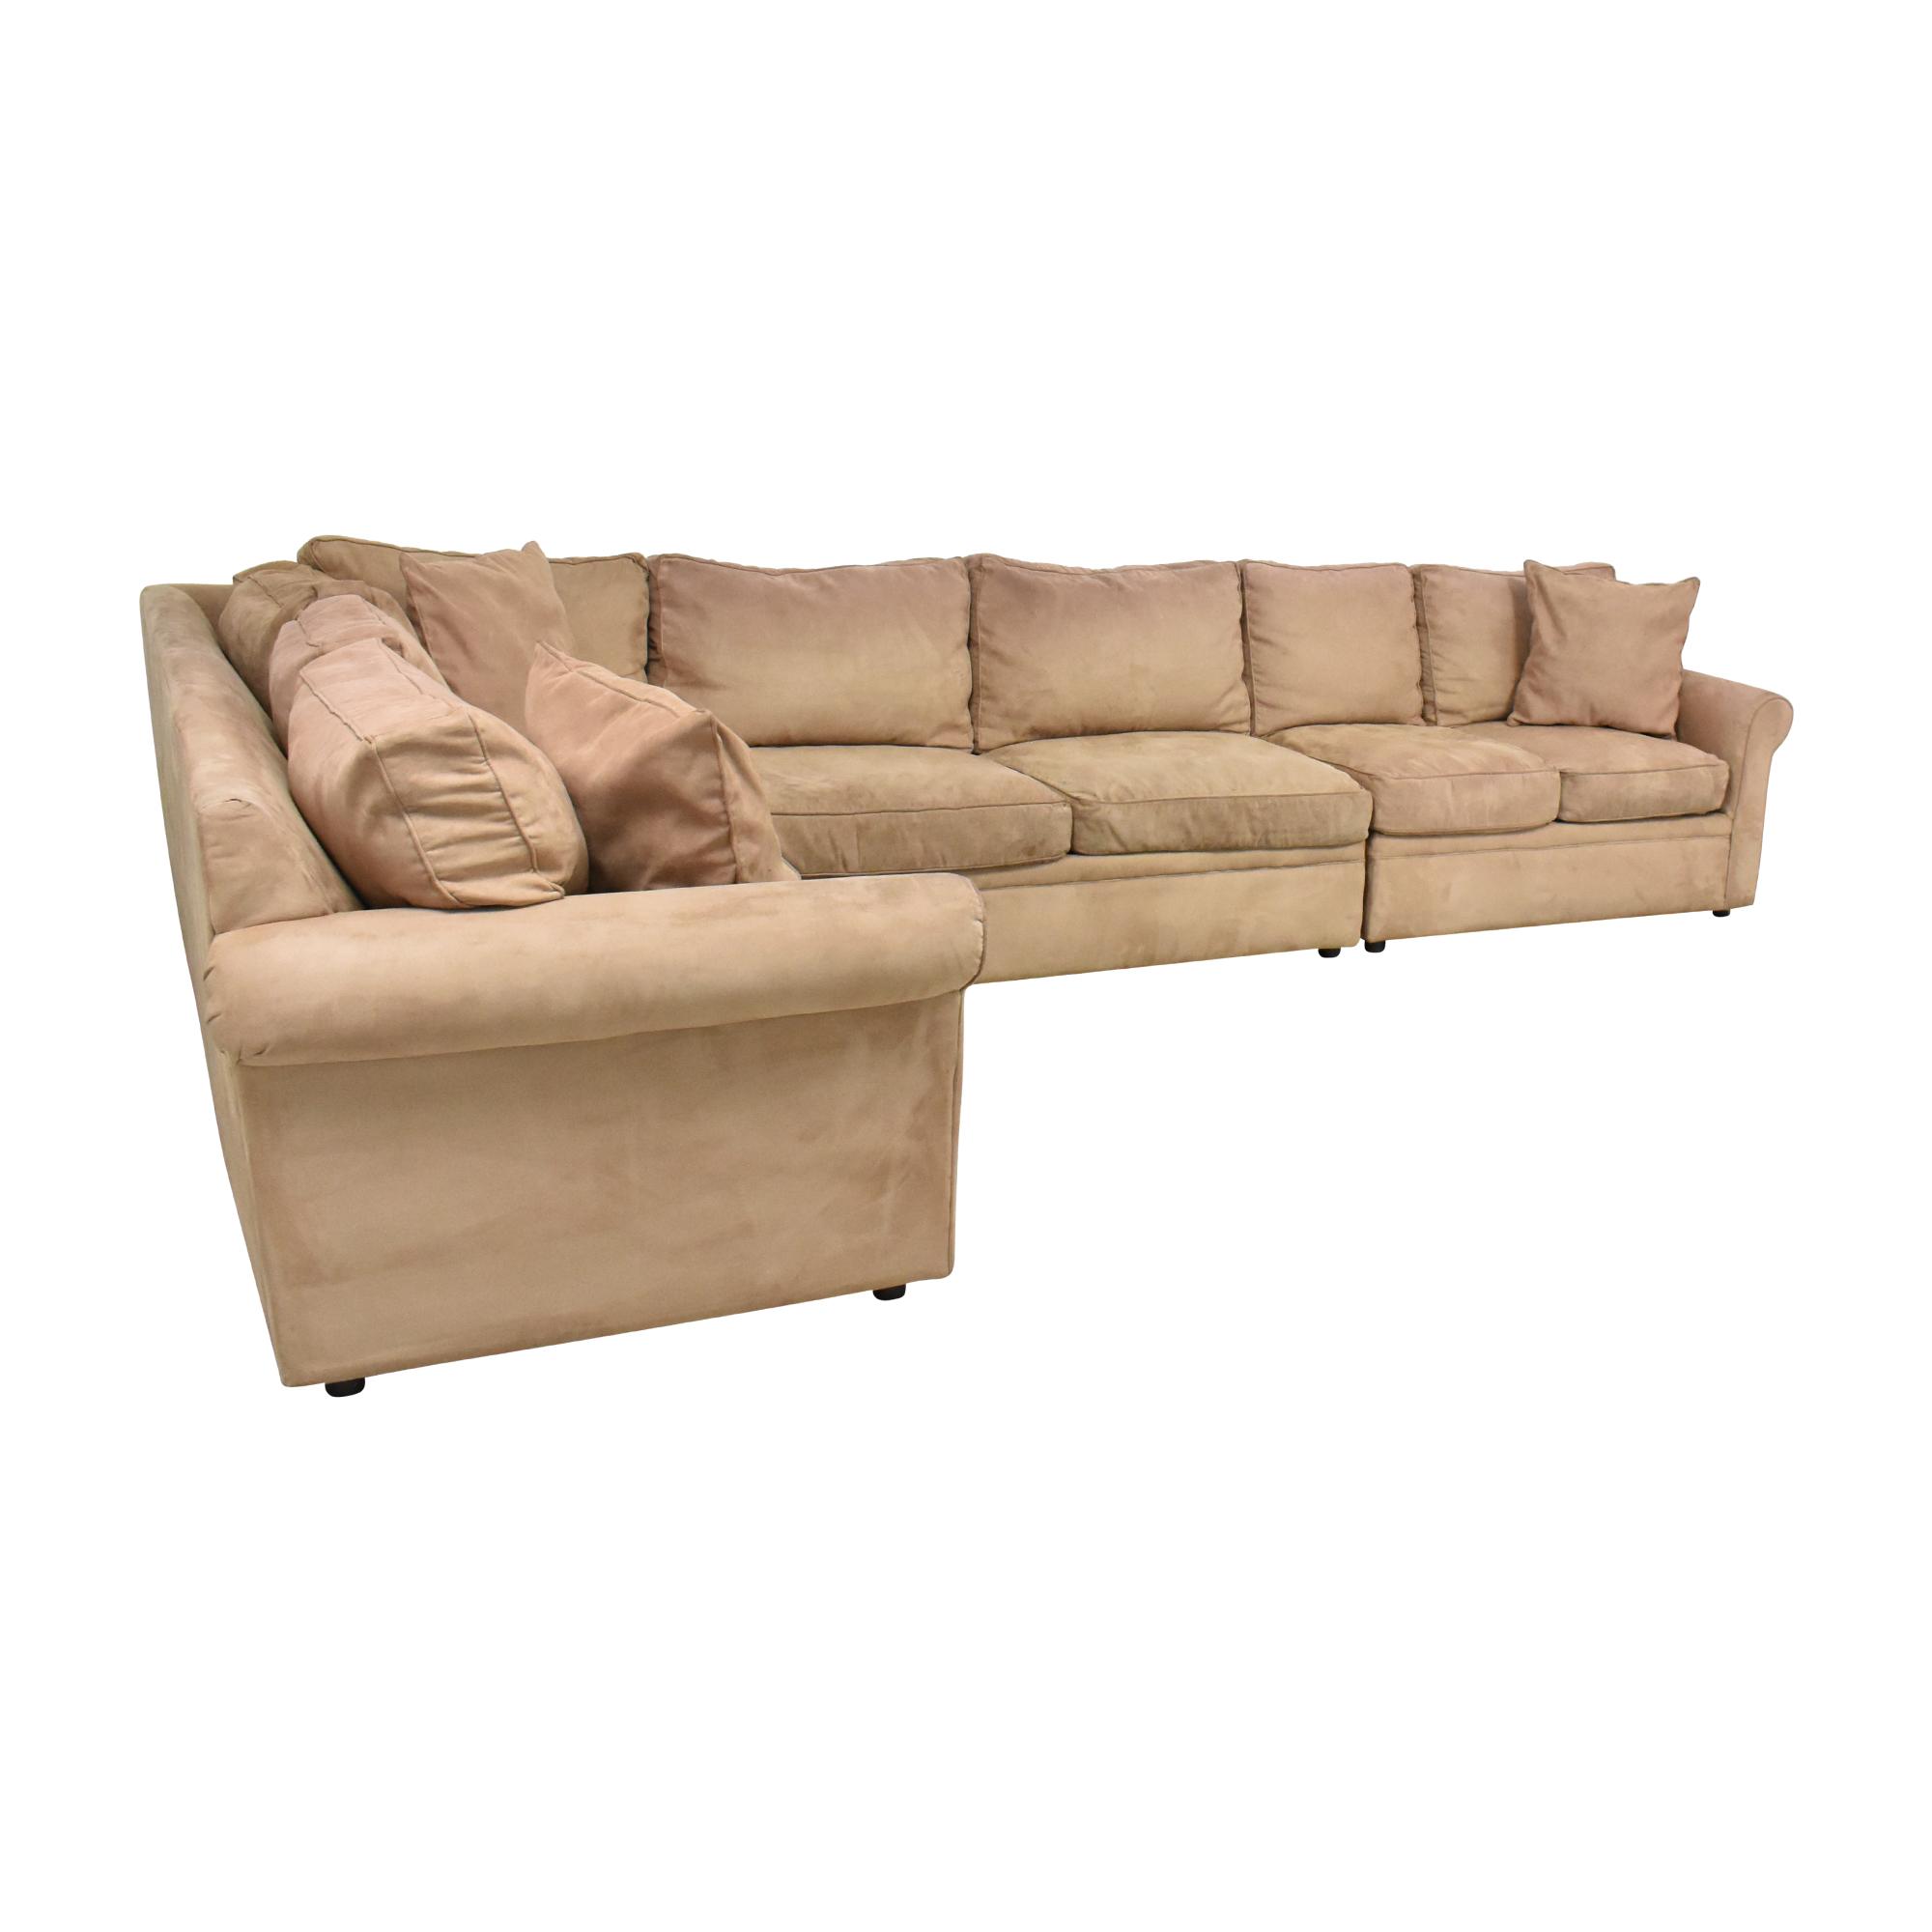 Rowe Furniture Rowe Furniture Corner Sectional Sofa ma